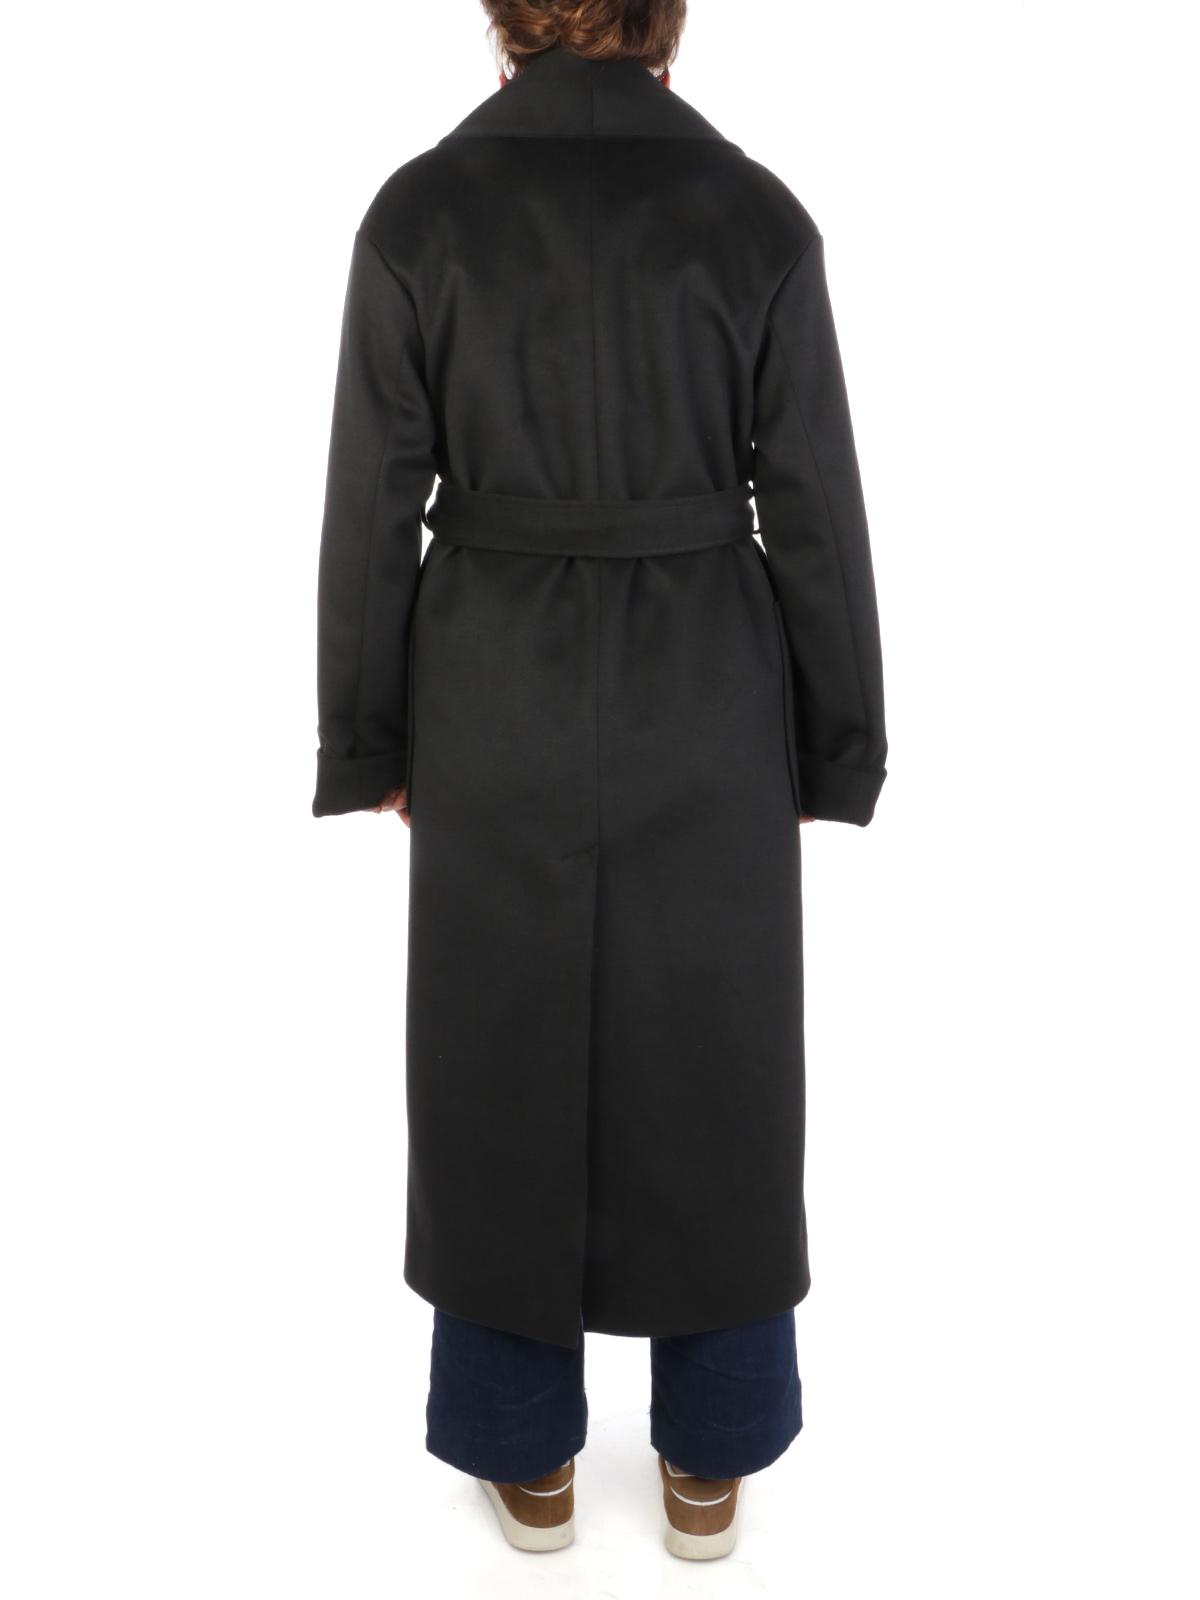 Immagine di Prive` | Coat Cappotto Marilu`